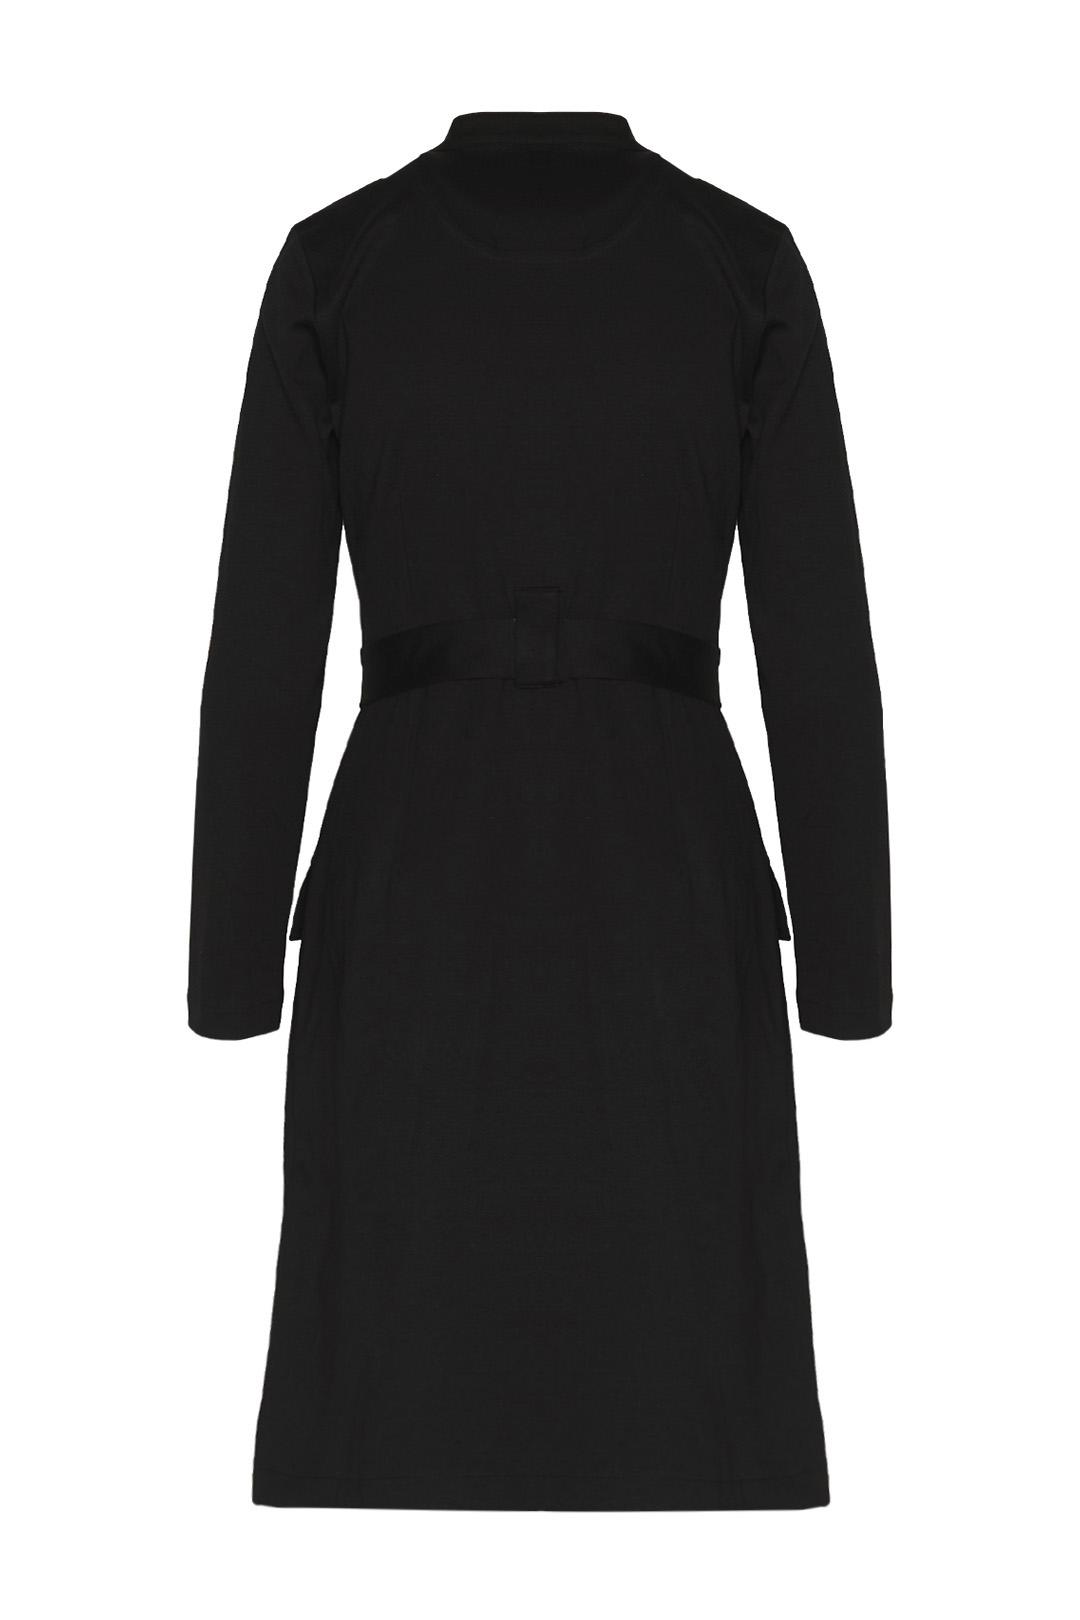 Milan stitch dress                       2